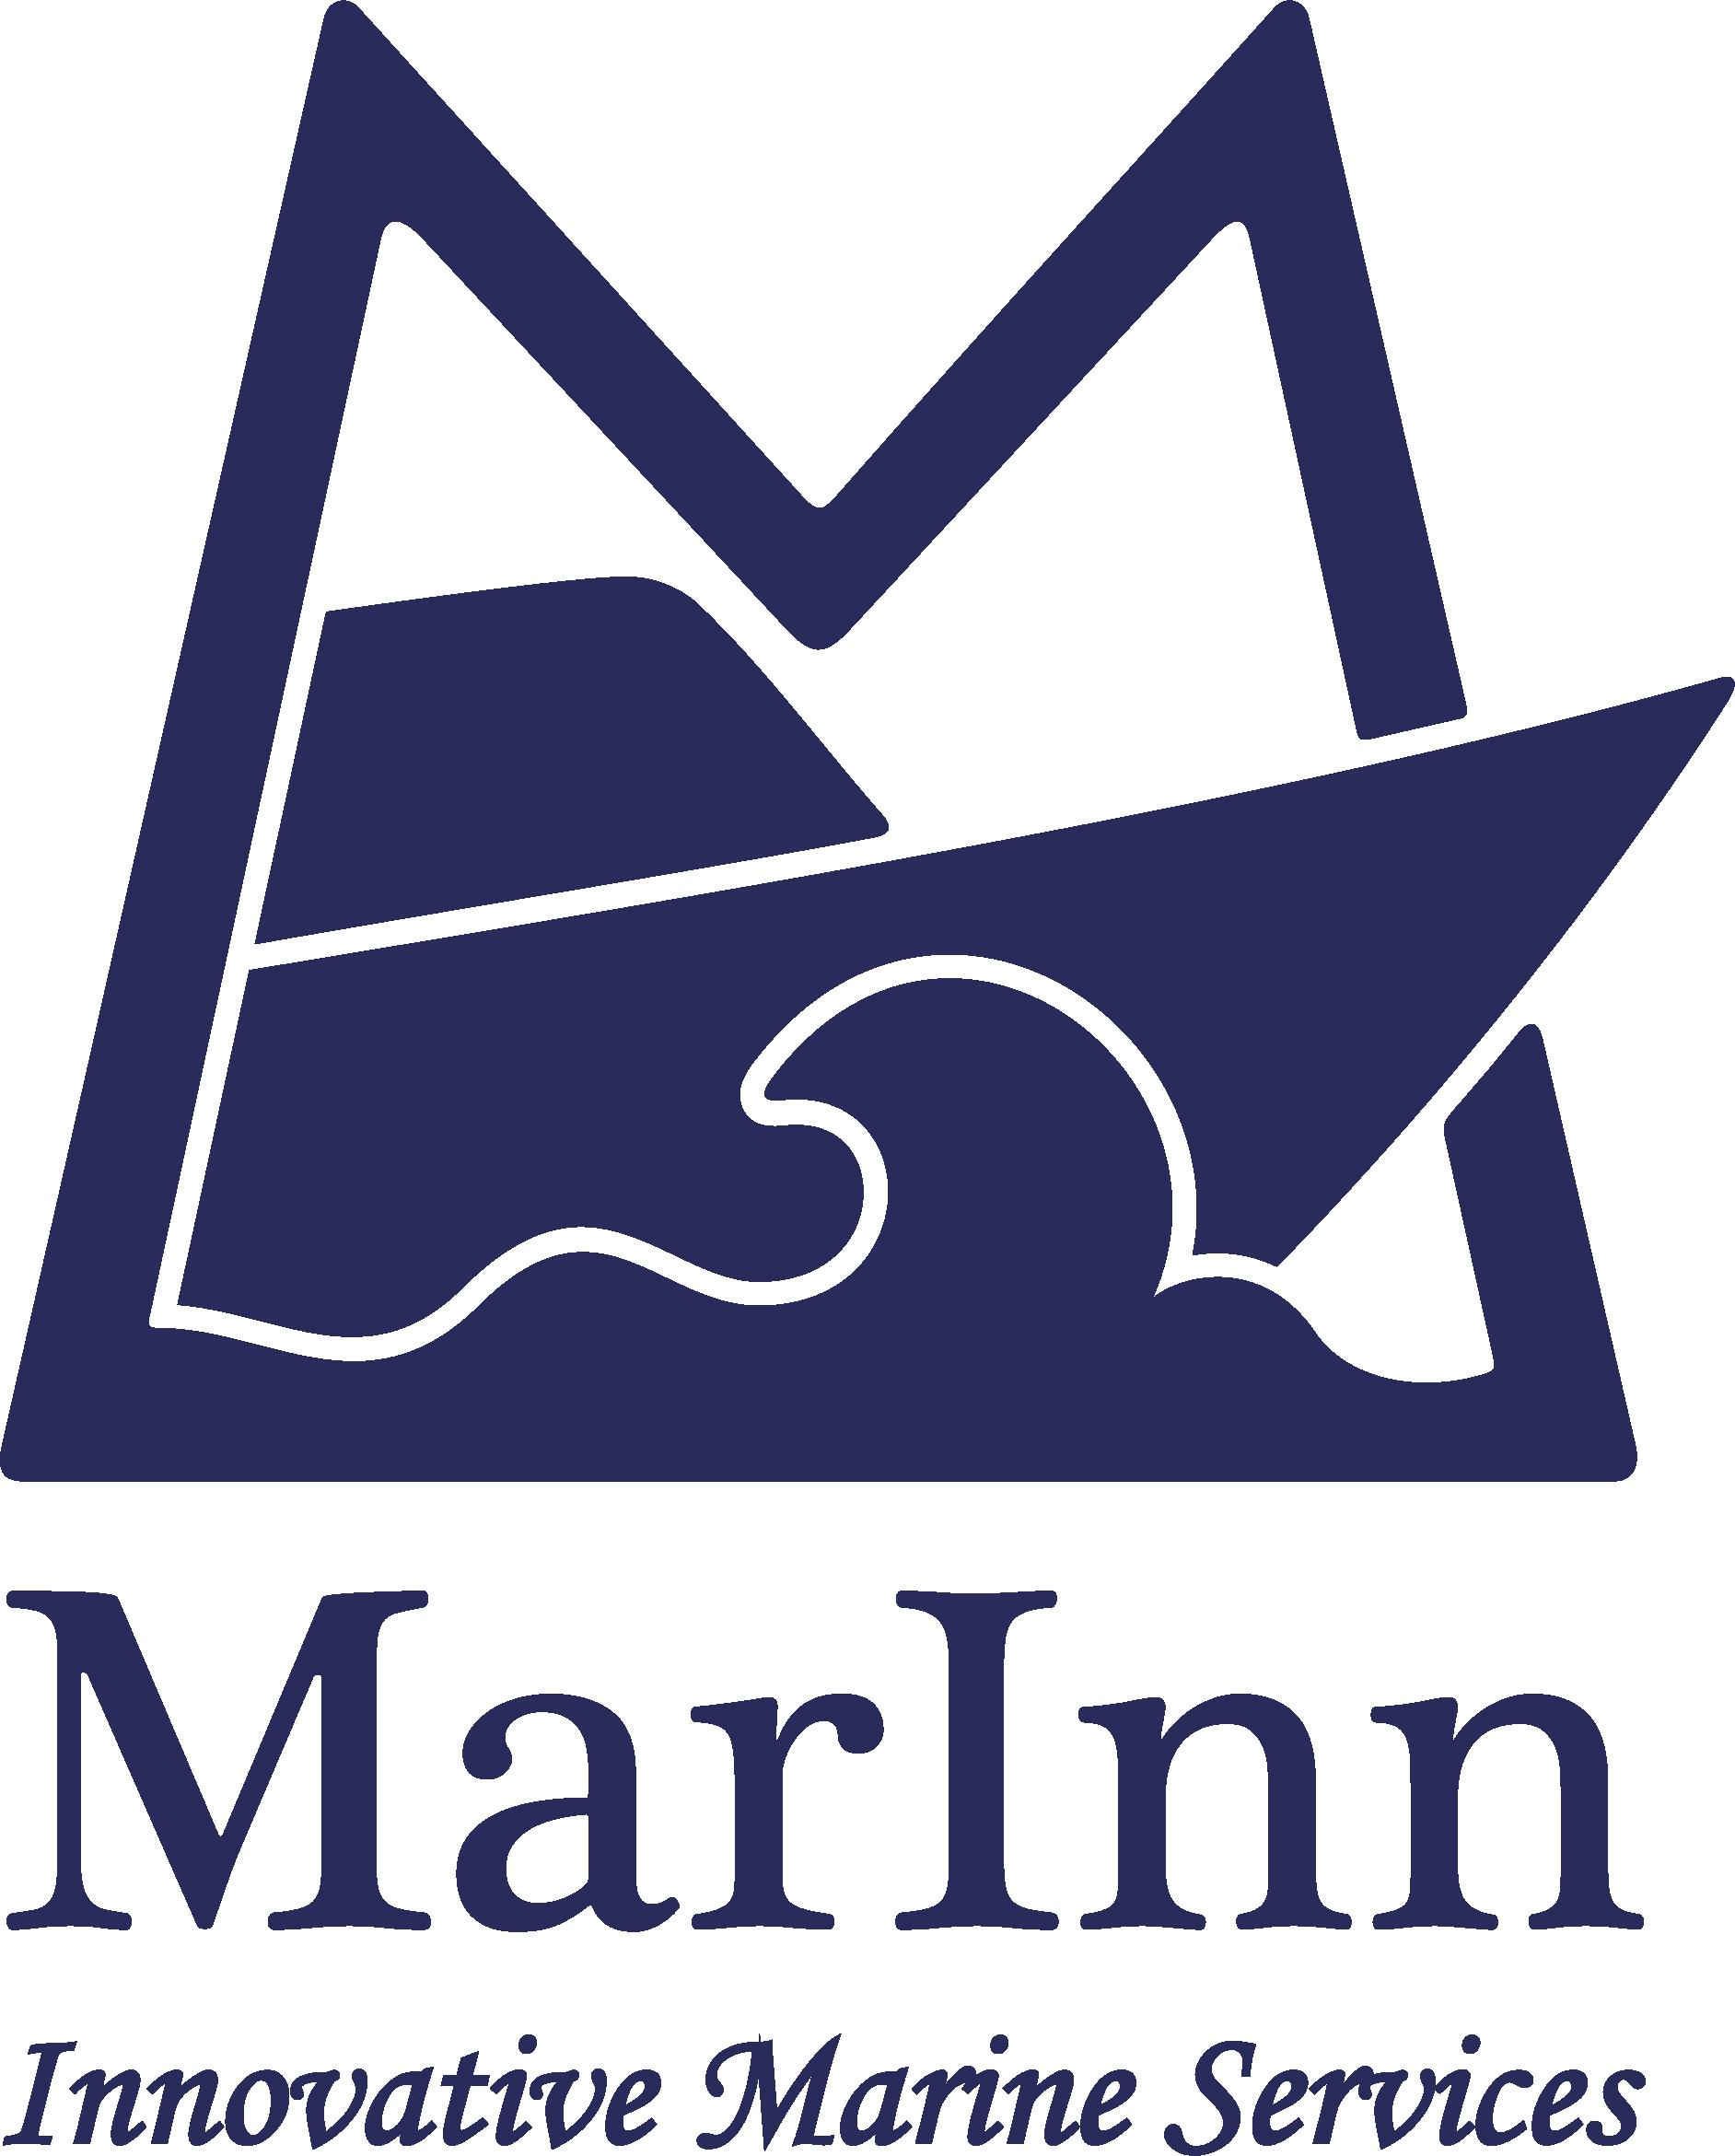 MarInn